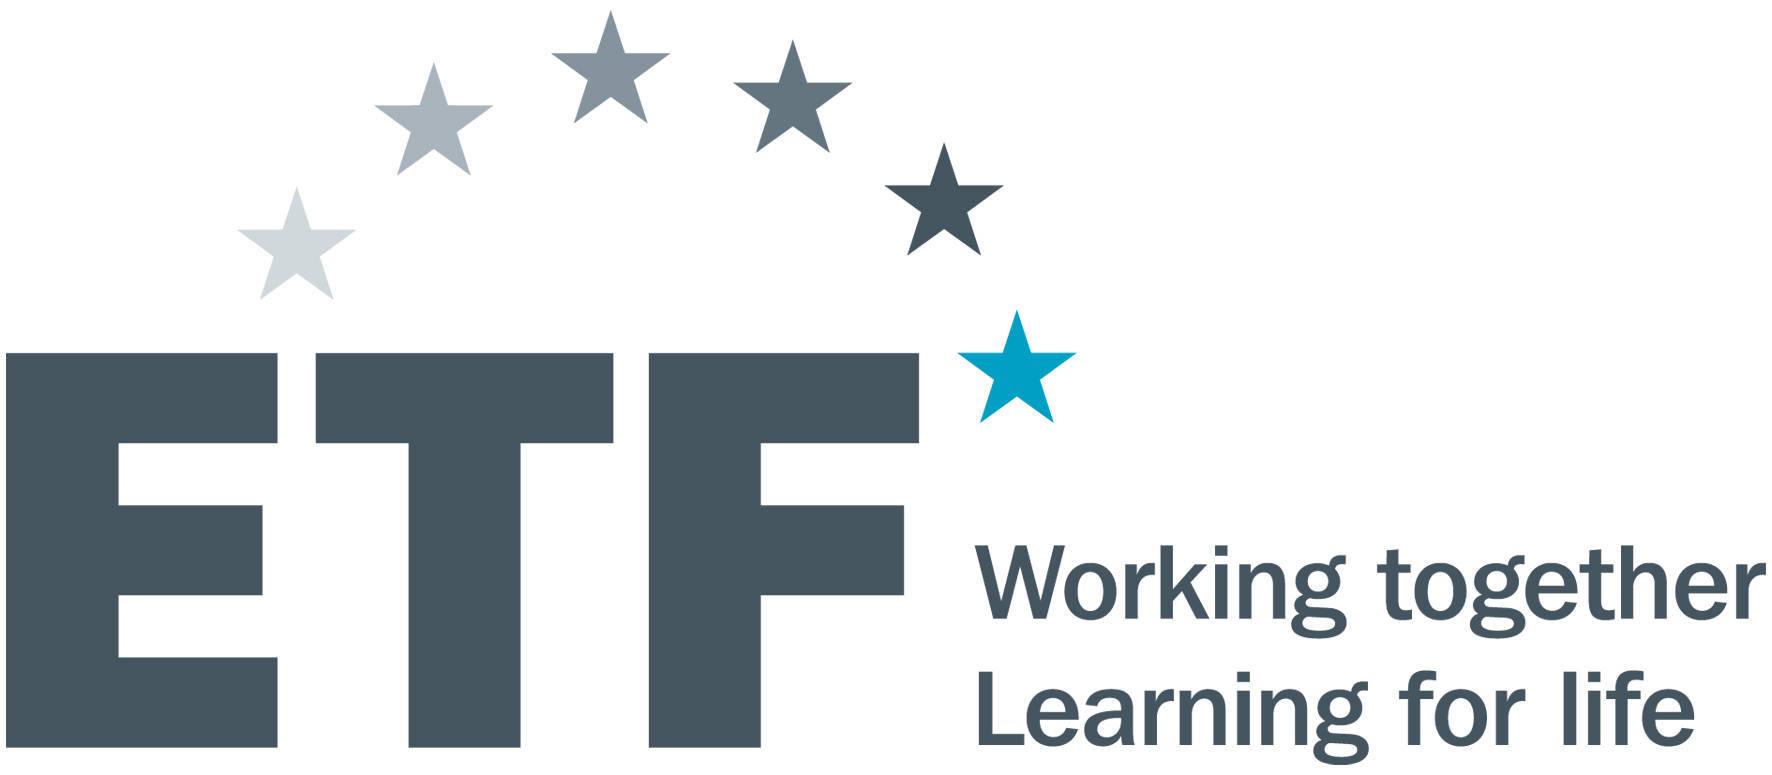 European Alliance For Apprenticeships (EAfA) – Regional Seminar For Candidate Countries – Budva, 26th October 2017